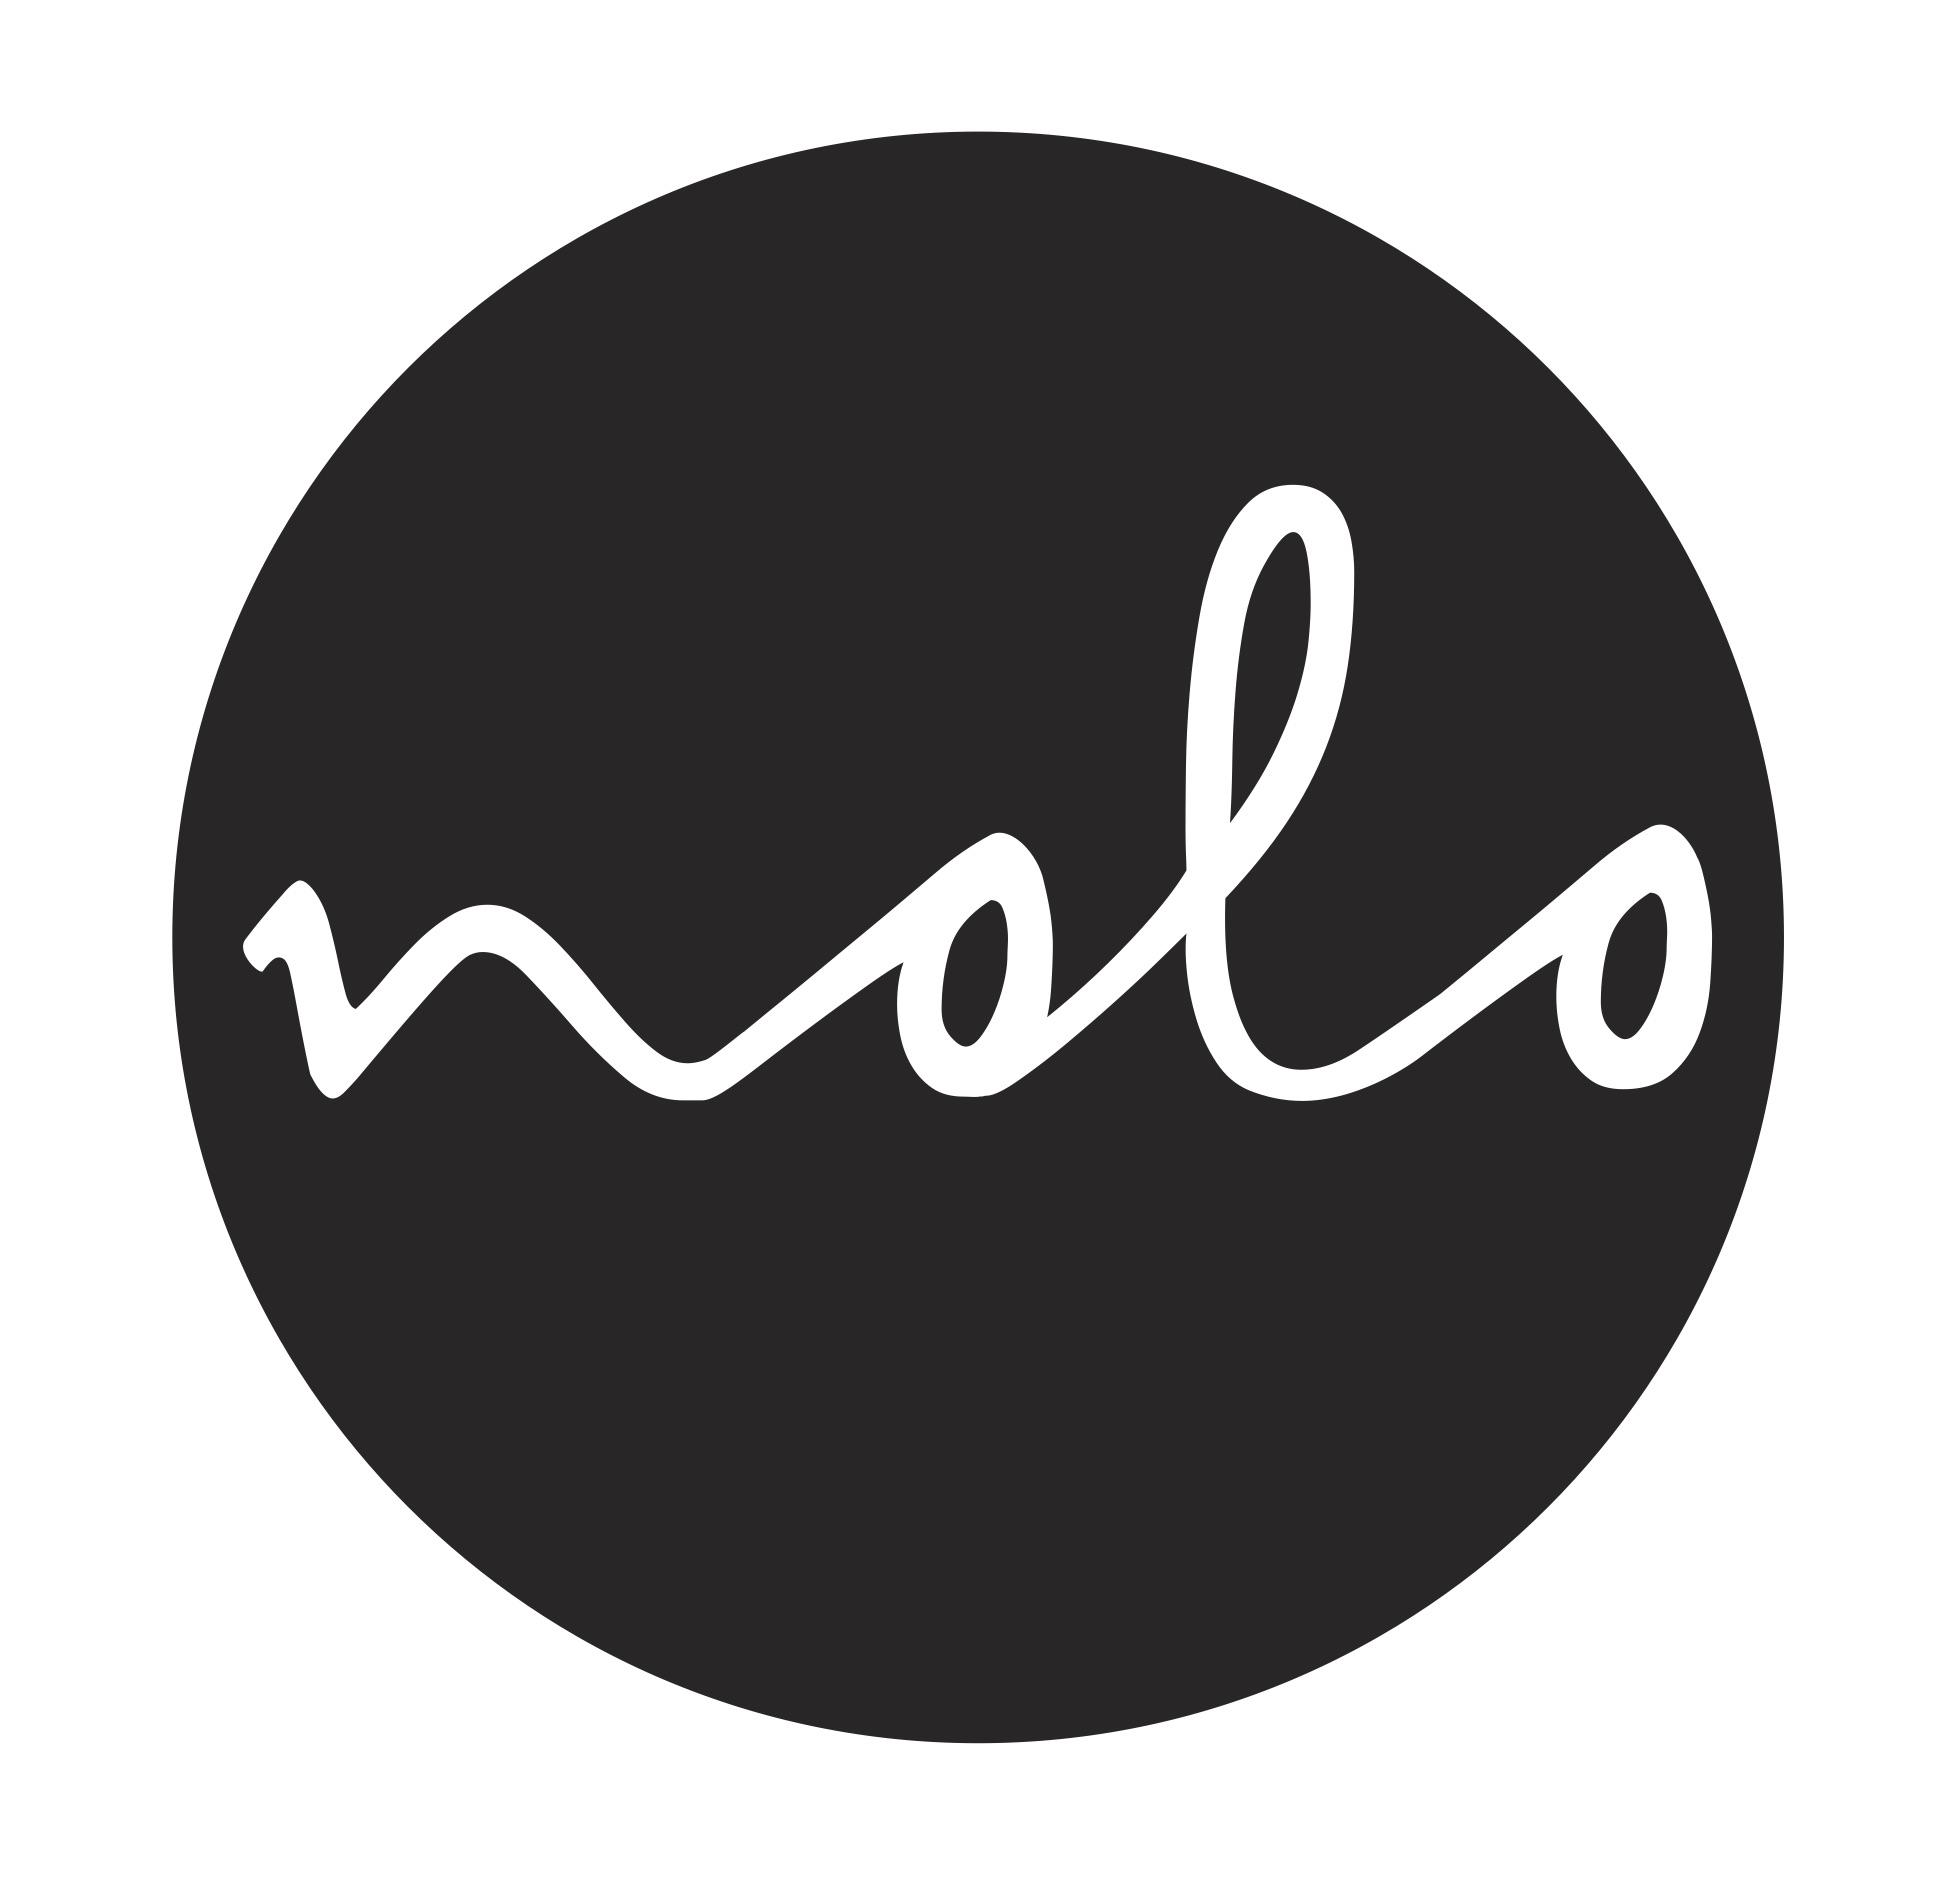 Nolo_EBC